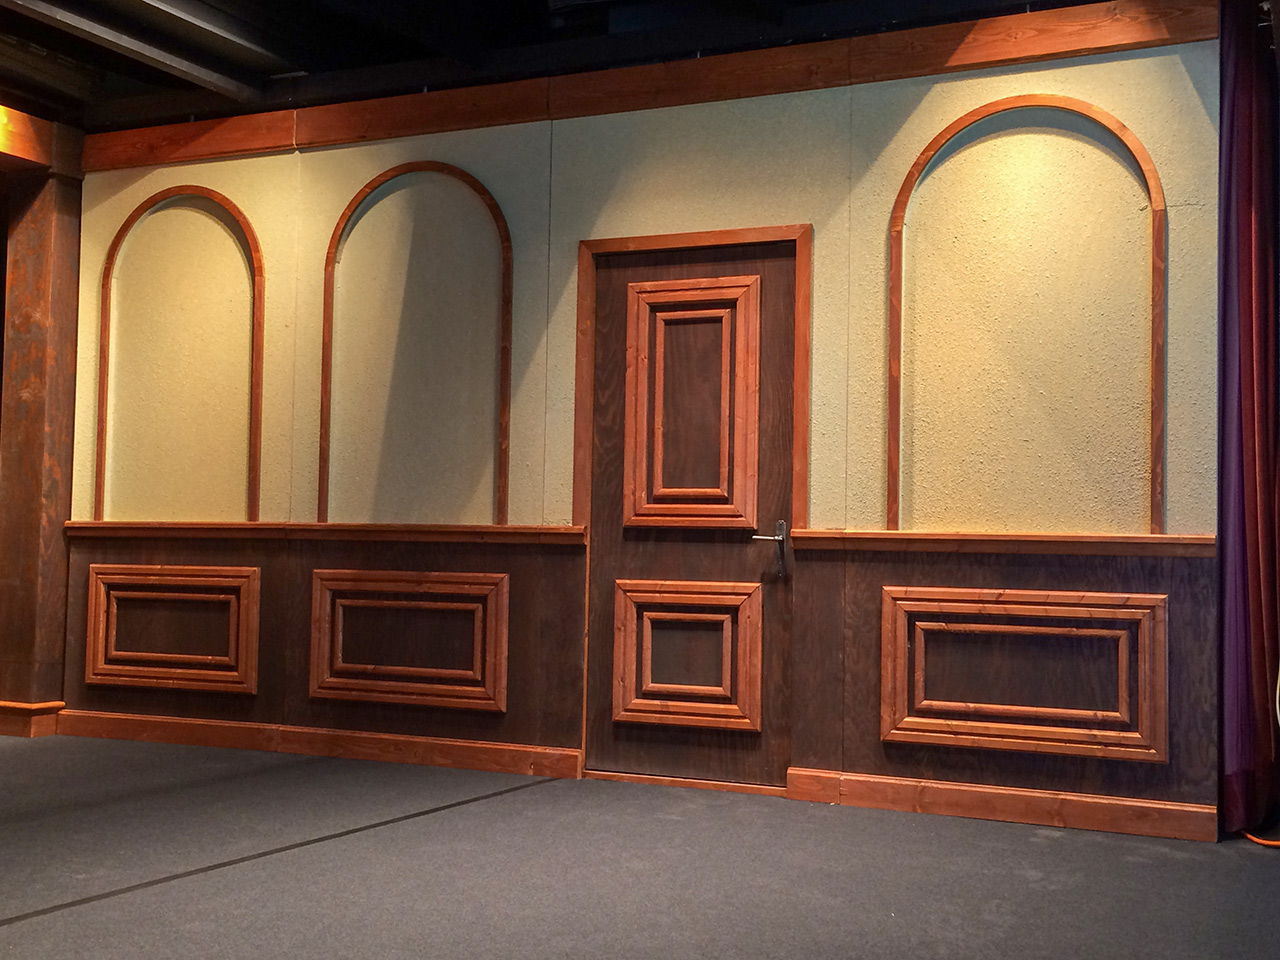 Bühnenbild Kultur - Operette Entlebuch - Madame Pompadur